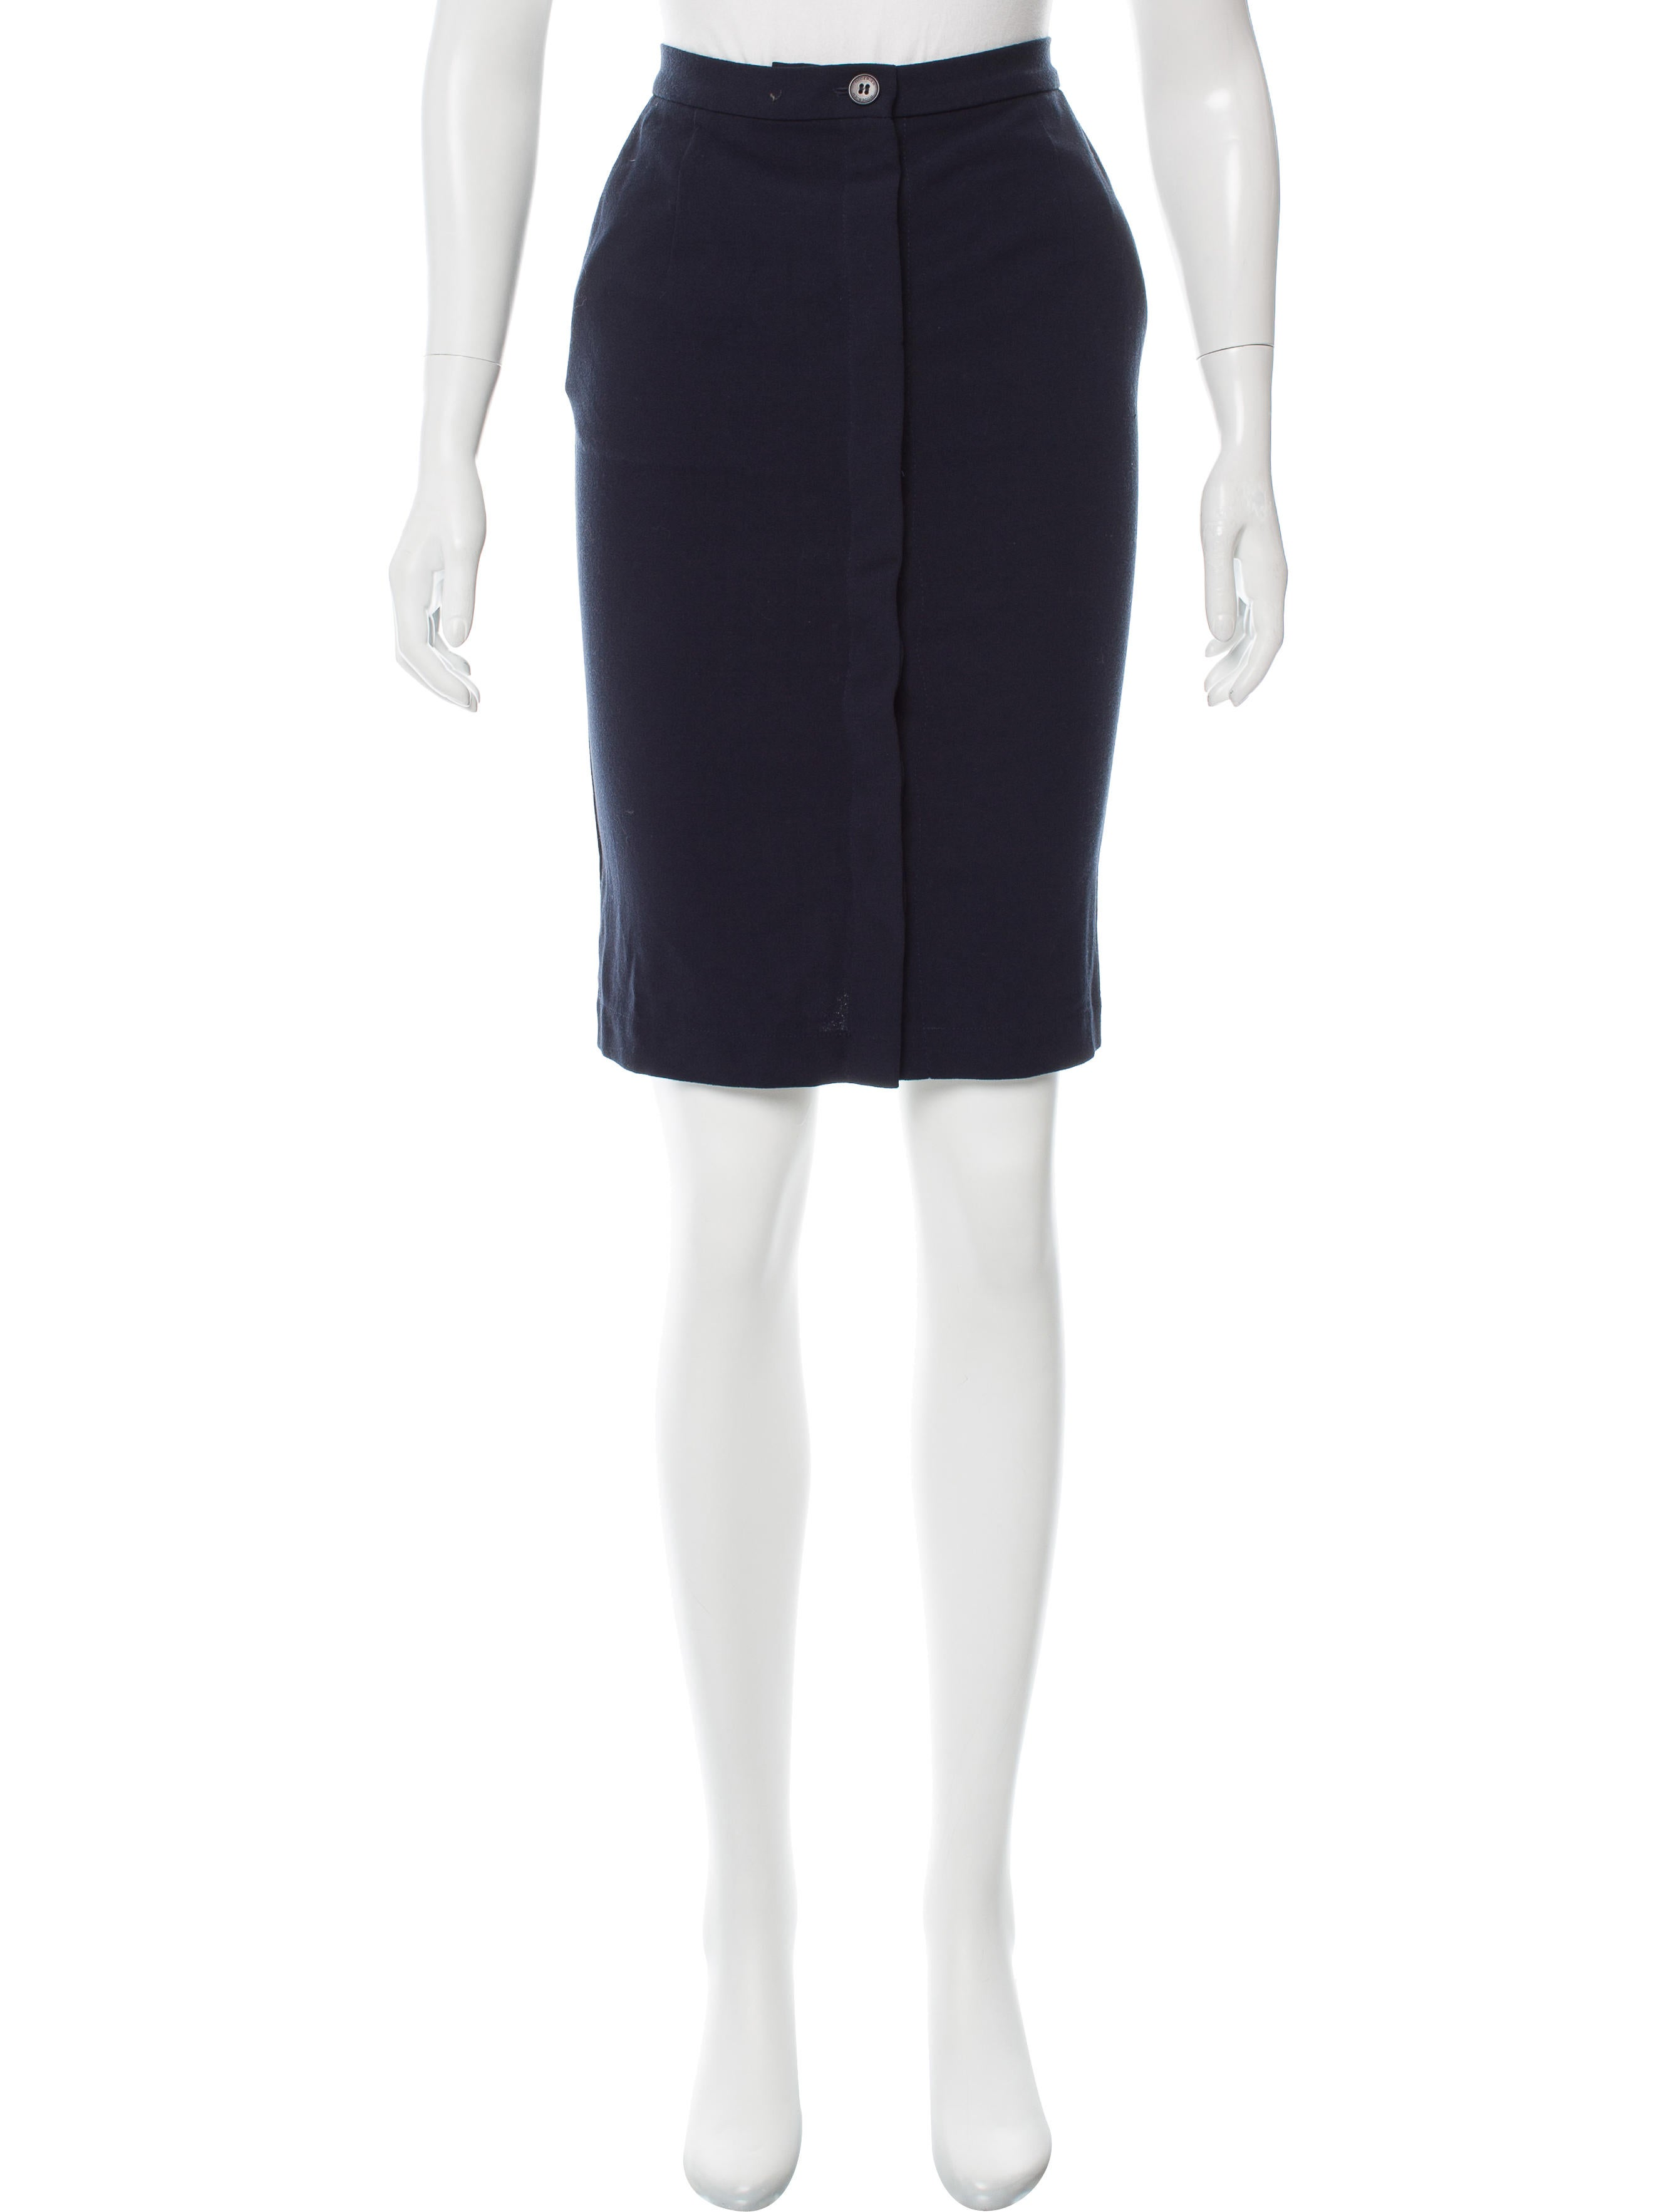 rodebjer knee length pencil skirt clothing wqz20289